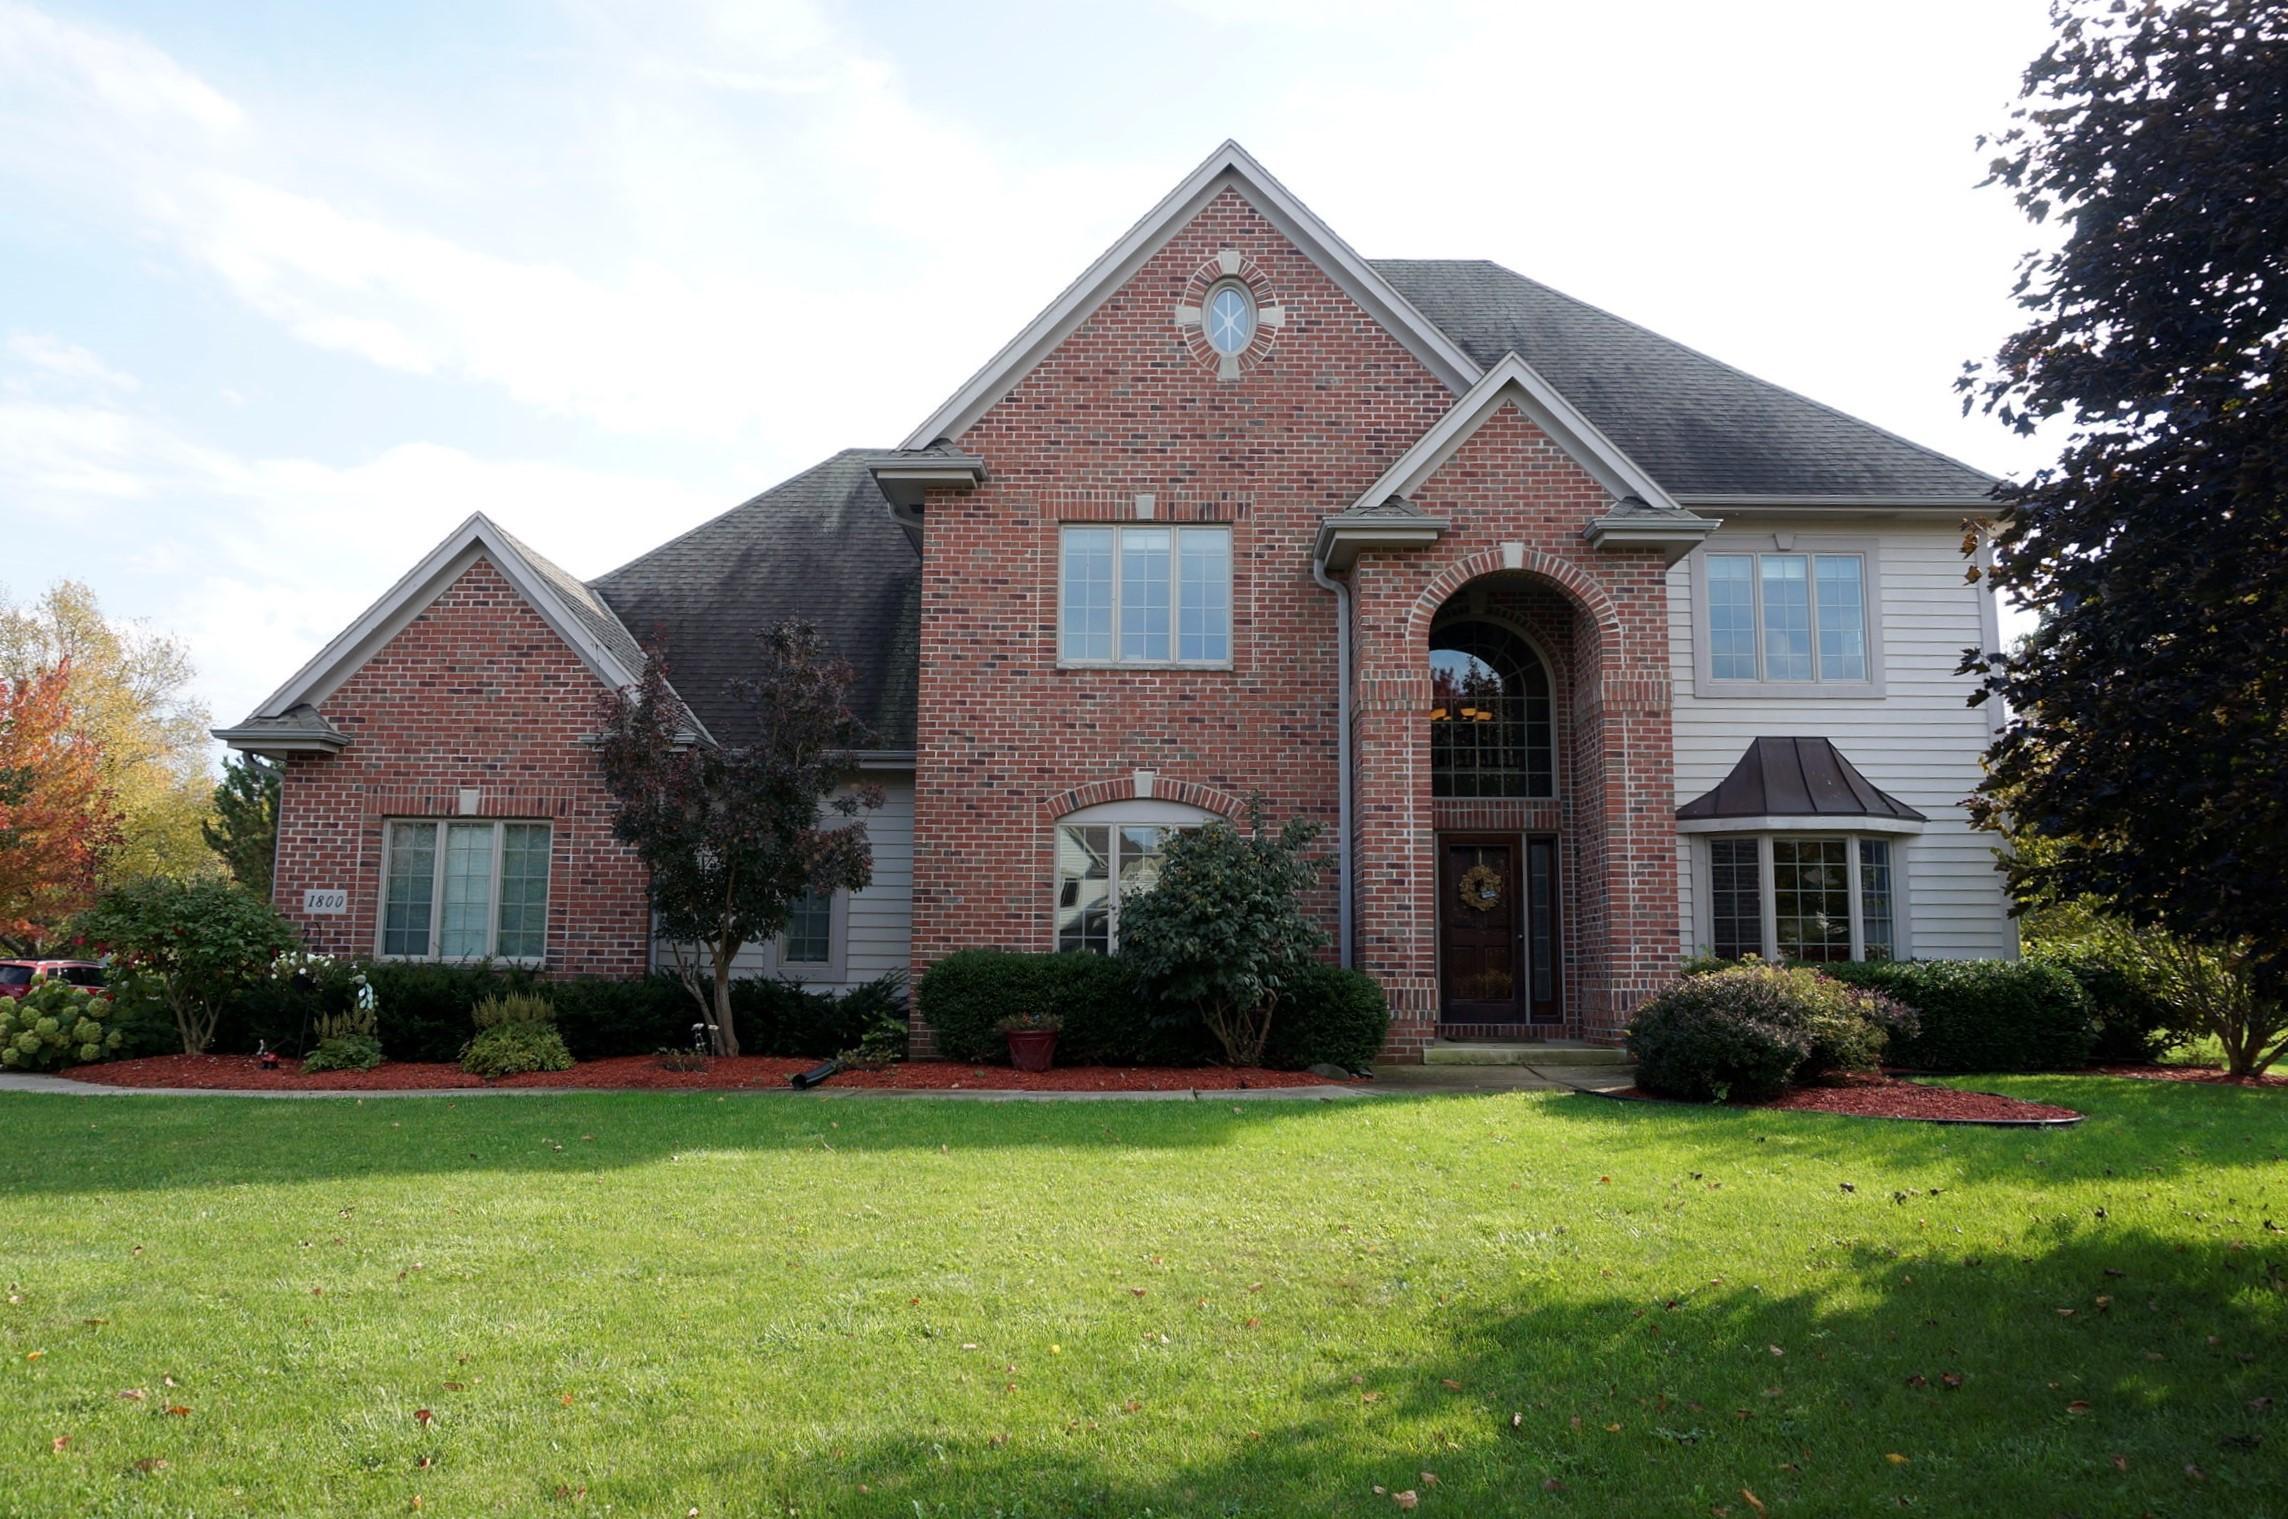 1800 Tallgrass Cir, Waukesha, Wisconsin 53188, 3 Bedrooms Bedrooms, ,2 BathroomsBathrooms,Single-Family,For Sale,Tallgrass Cir,1610045